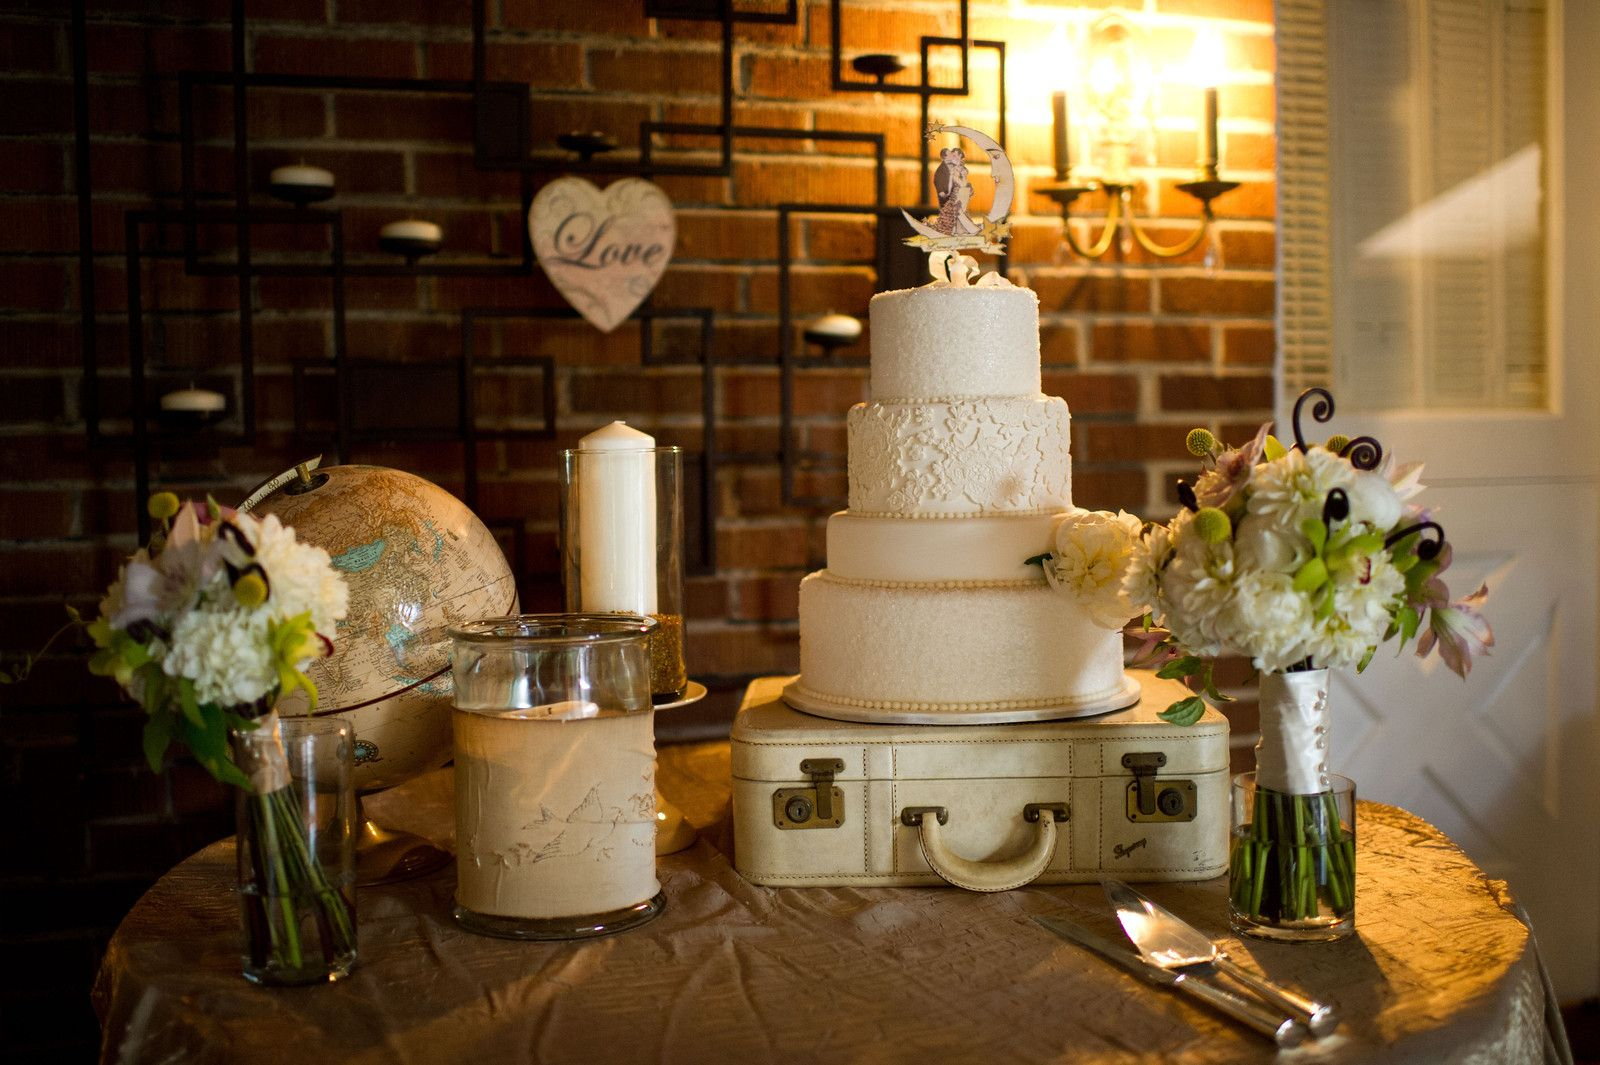 Awesome Flea Market Vintage Cake Display Wedding Cake Display Wedding Cakes Vintage Lace Wedding Cake